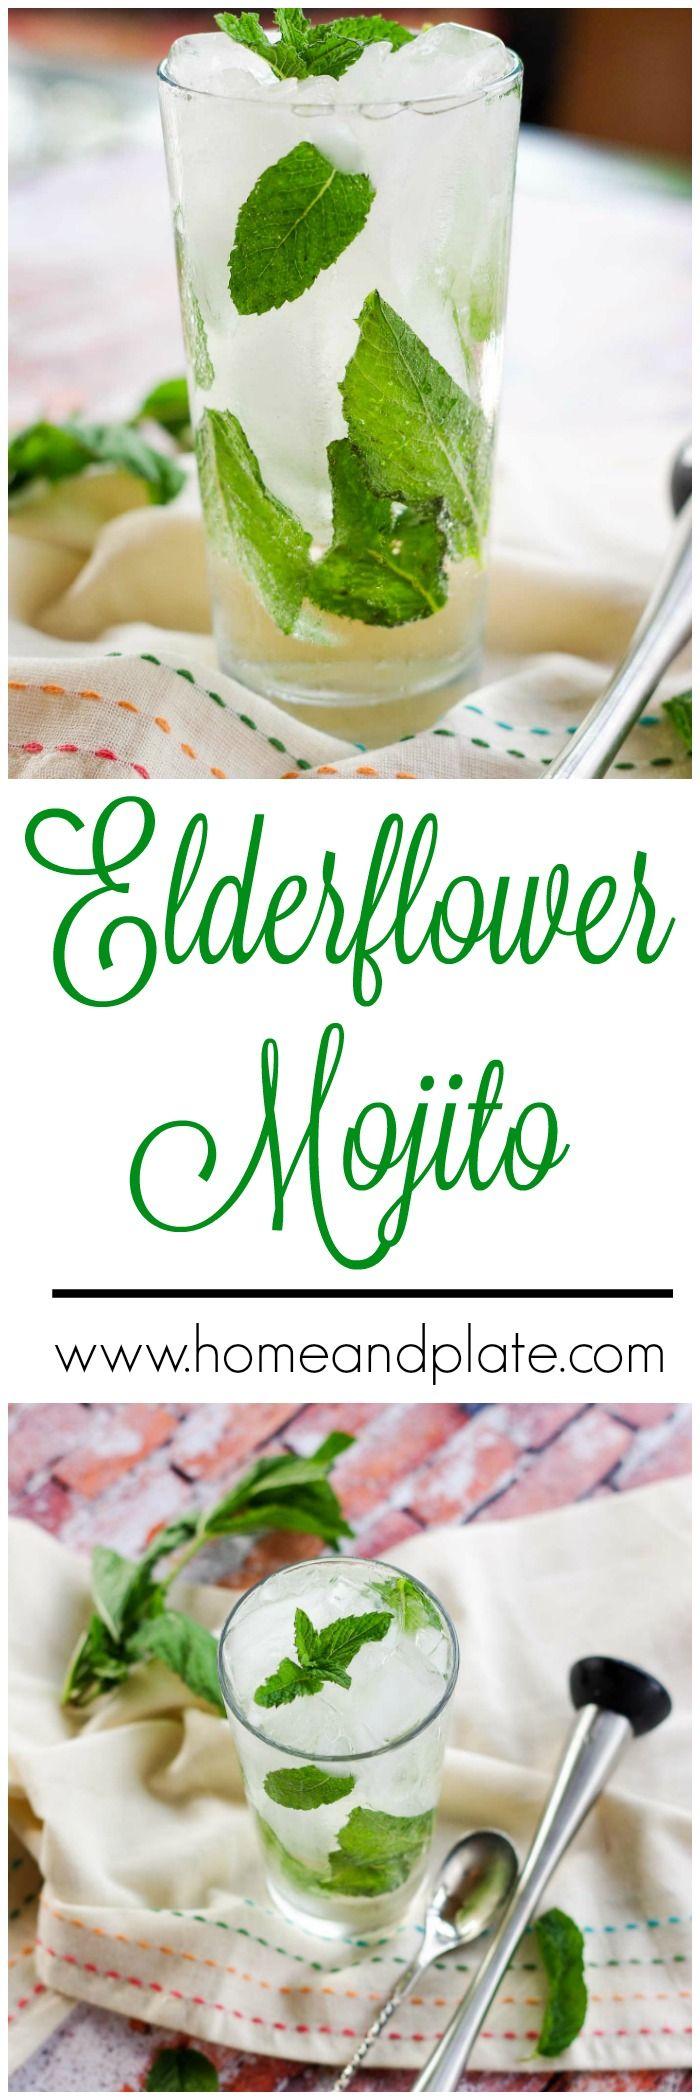 Elderflower Mojito Cocktail   www.homeandplate.com   This refreshing summer cocktail features rum, mint, fresh lime juice and a secret ingredient - St. Germain Elderflower Liqueur.